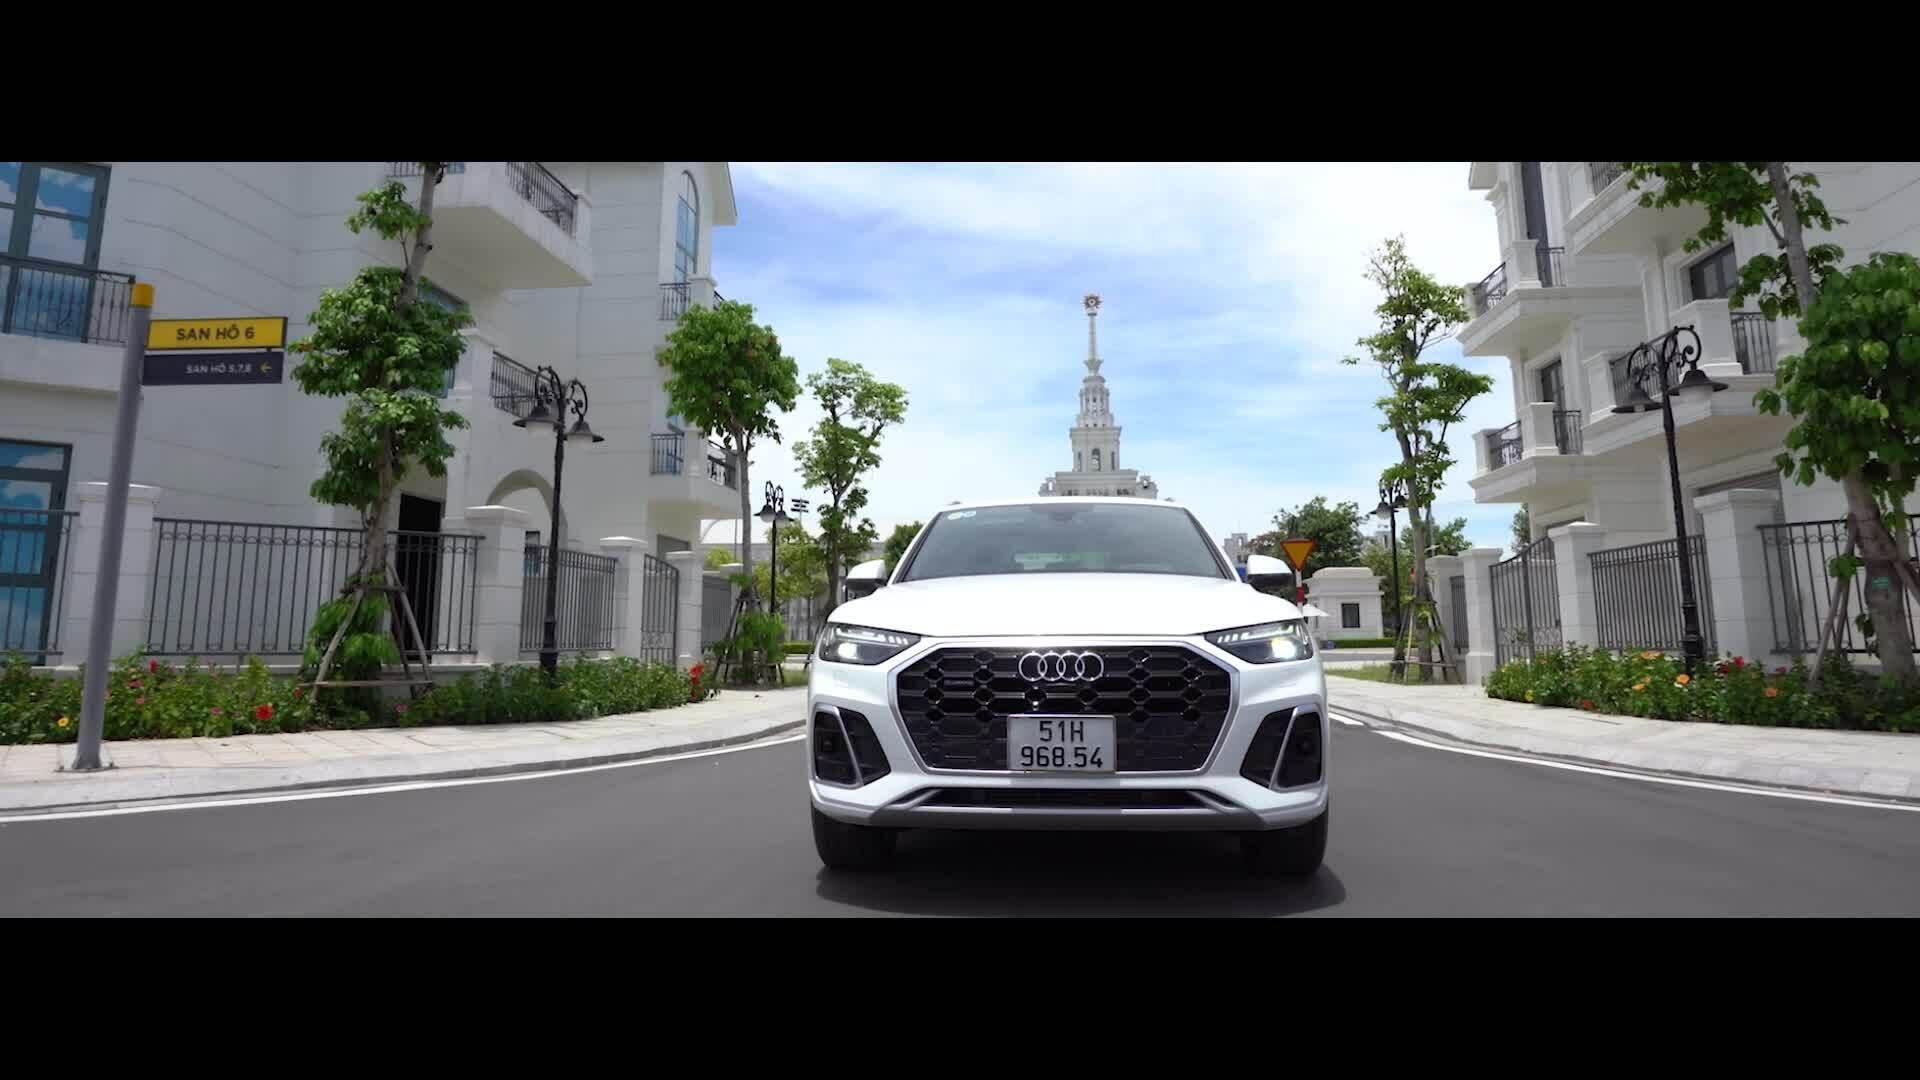 Audi Q5 2021 – Audi's most harmonious luxury SUV